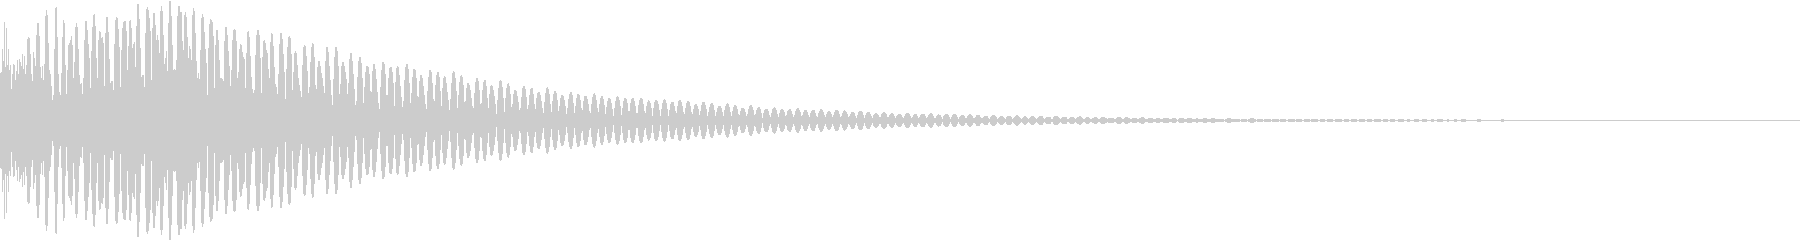 DTM Tom 13 オリジナル音源の未再生の波形